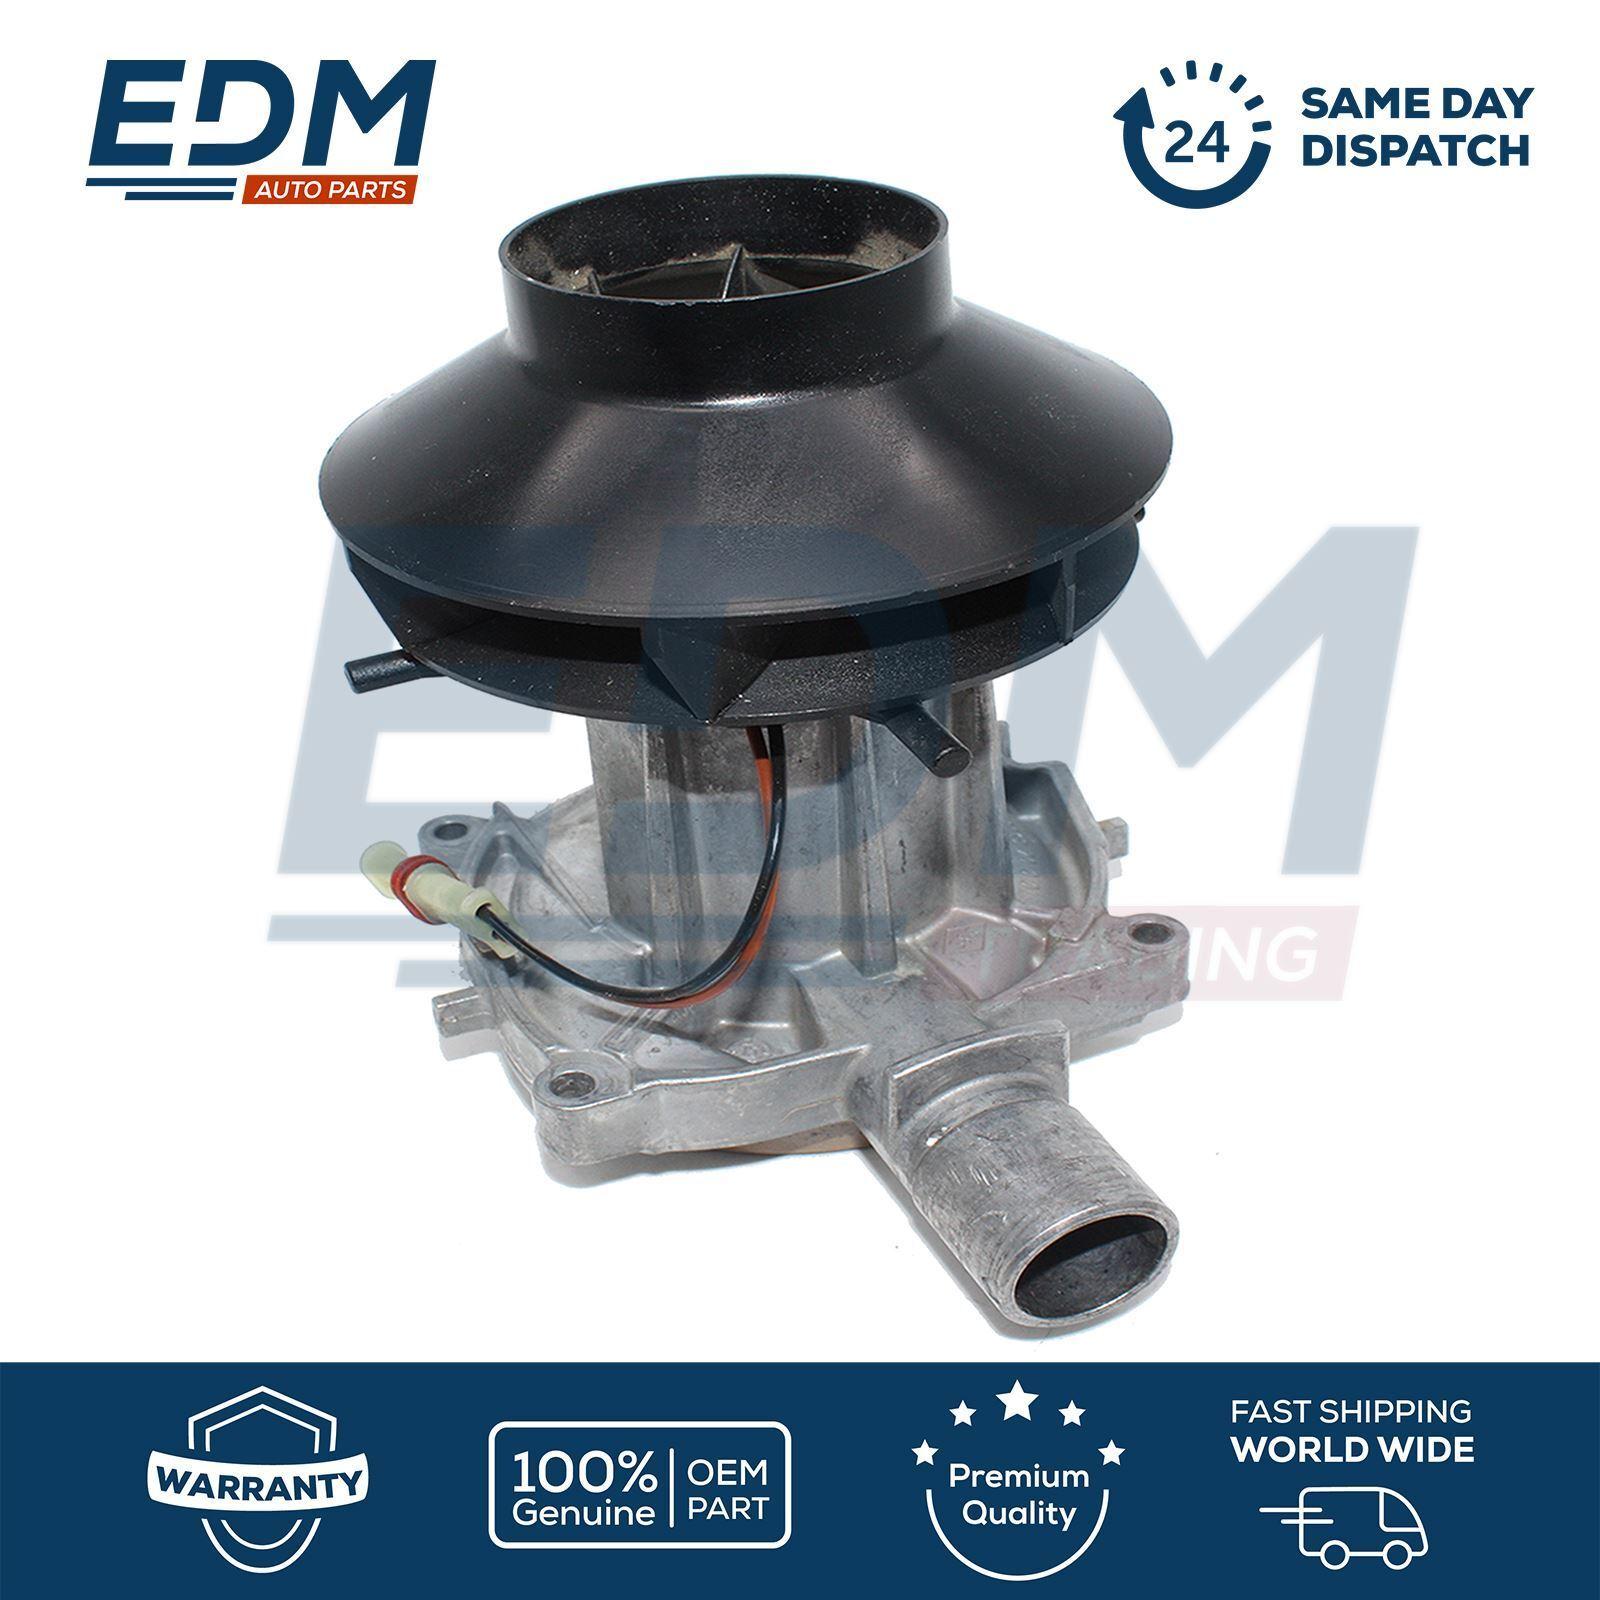 EBERSPACHER Airtronic 24V D4 24V Airtronic Gebläse Motor (252114992000) 234996